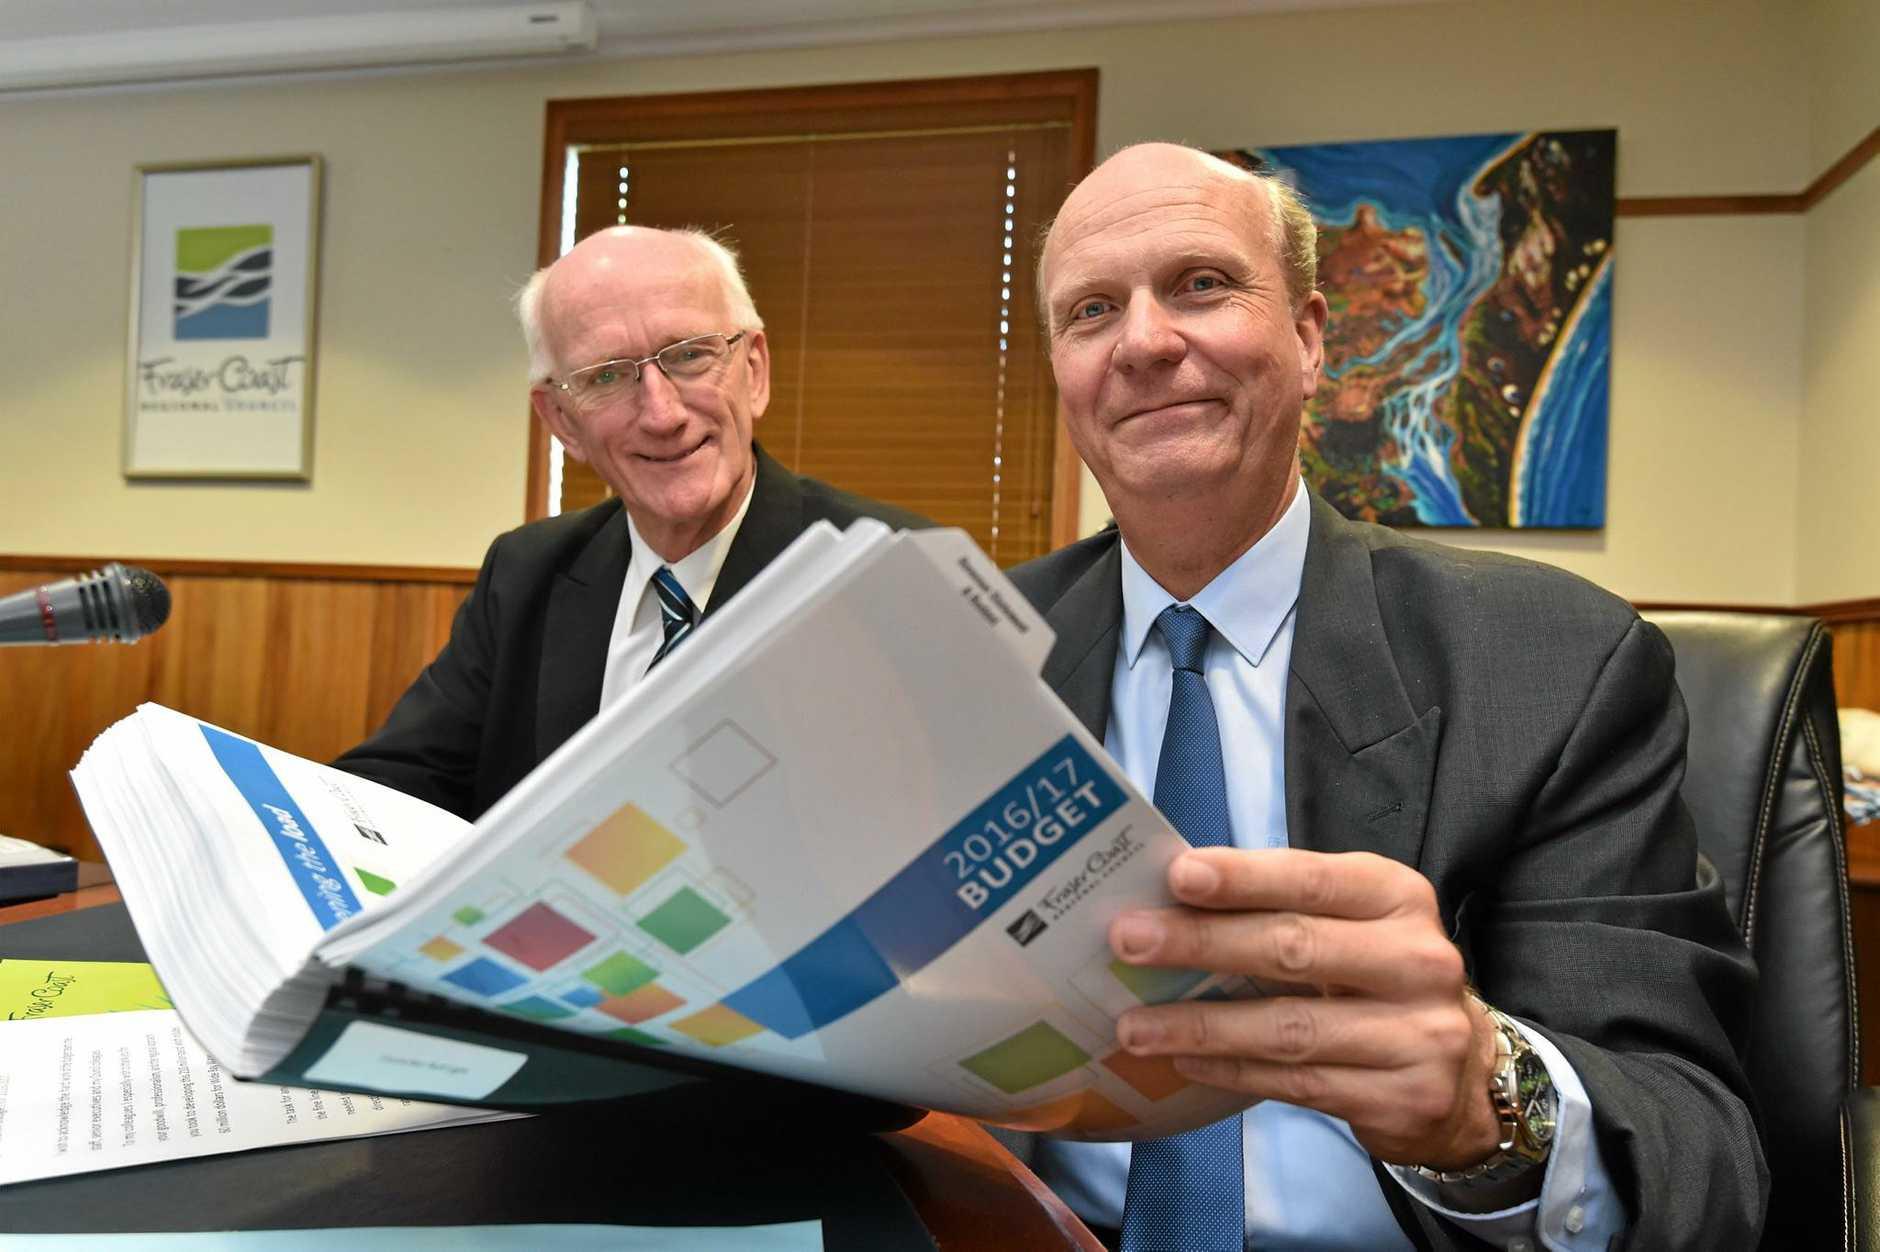 Fraser Coast Regional Council 2016/17 budget - Mayor Chris Loft with Cr. Rolf Light.